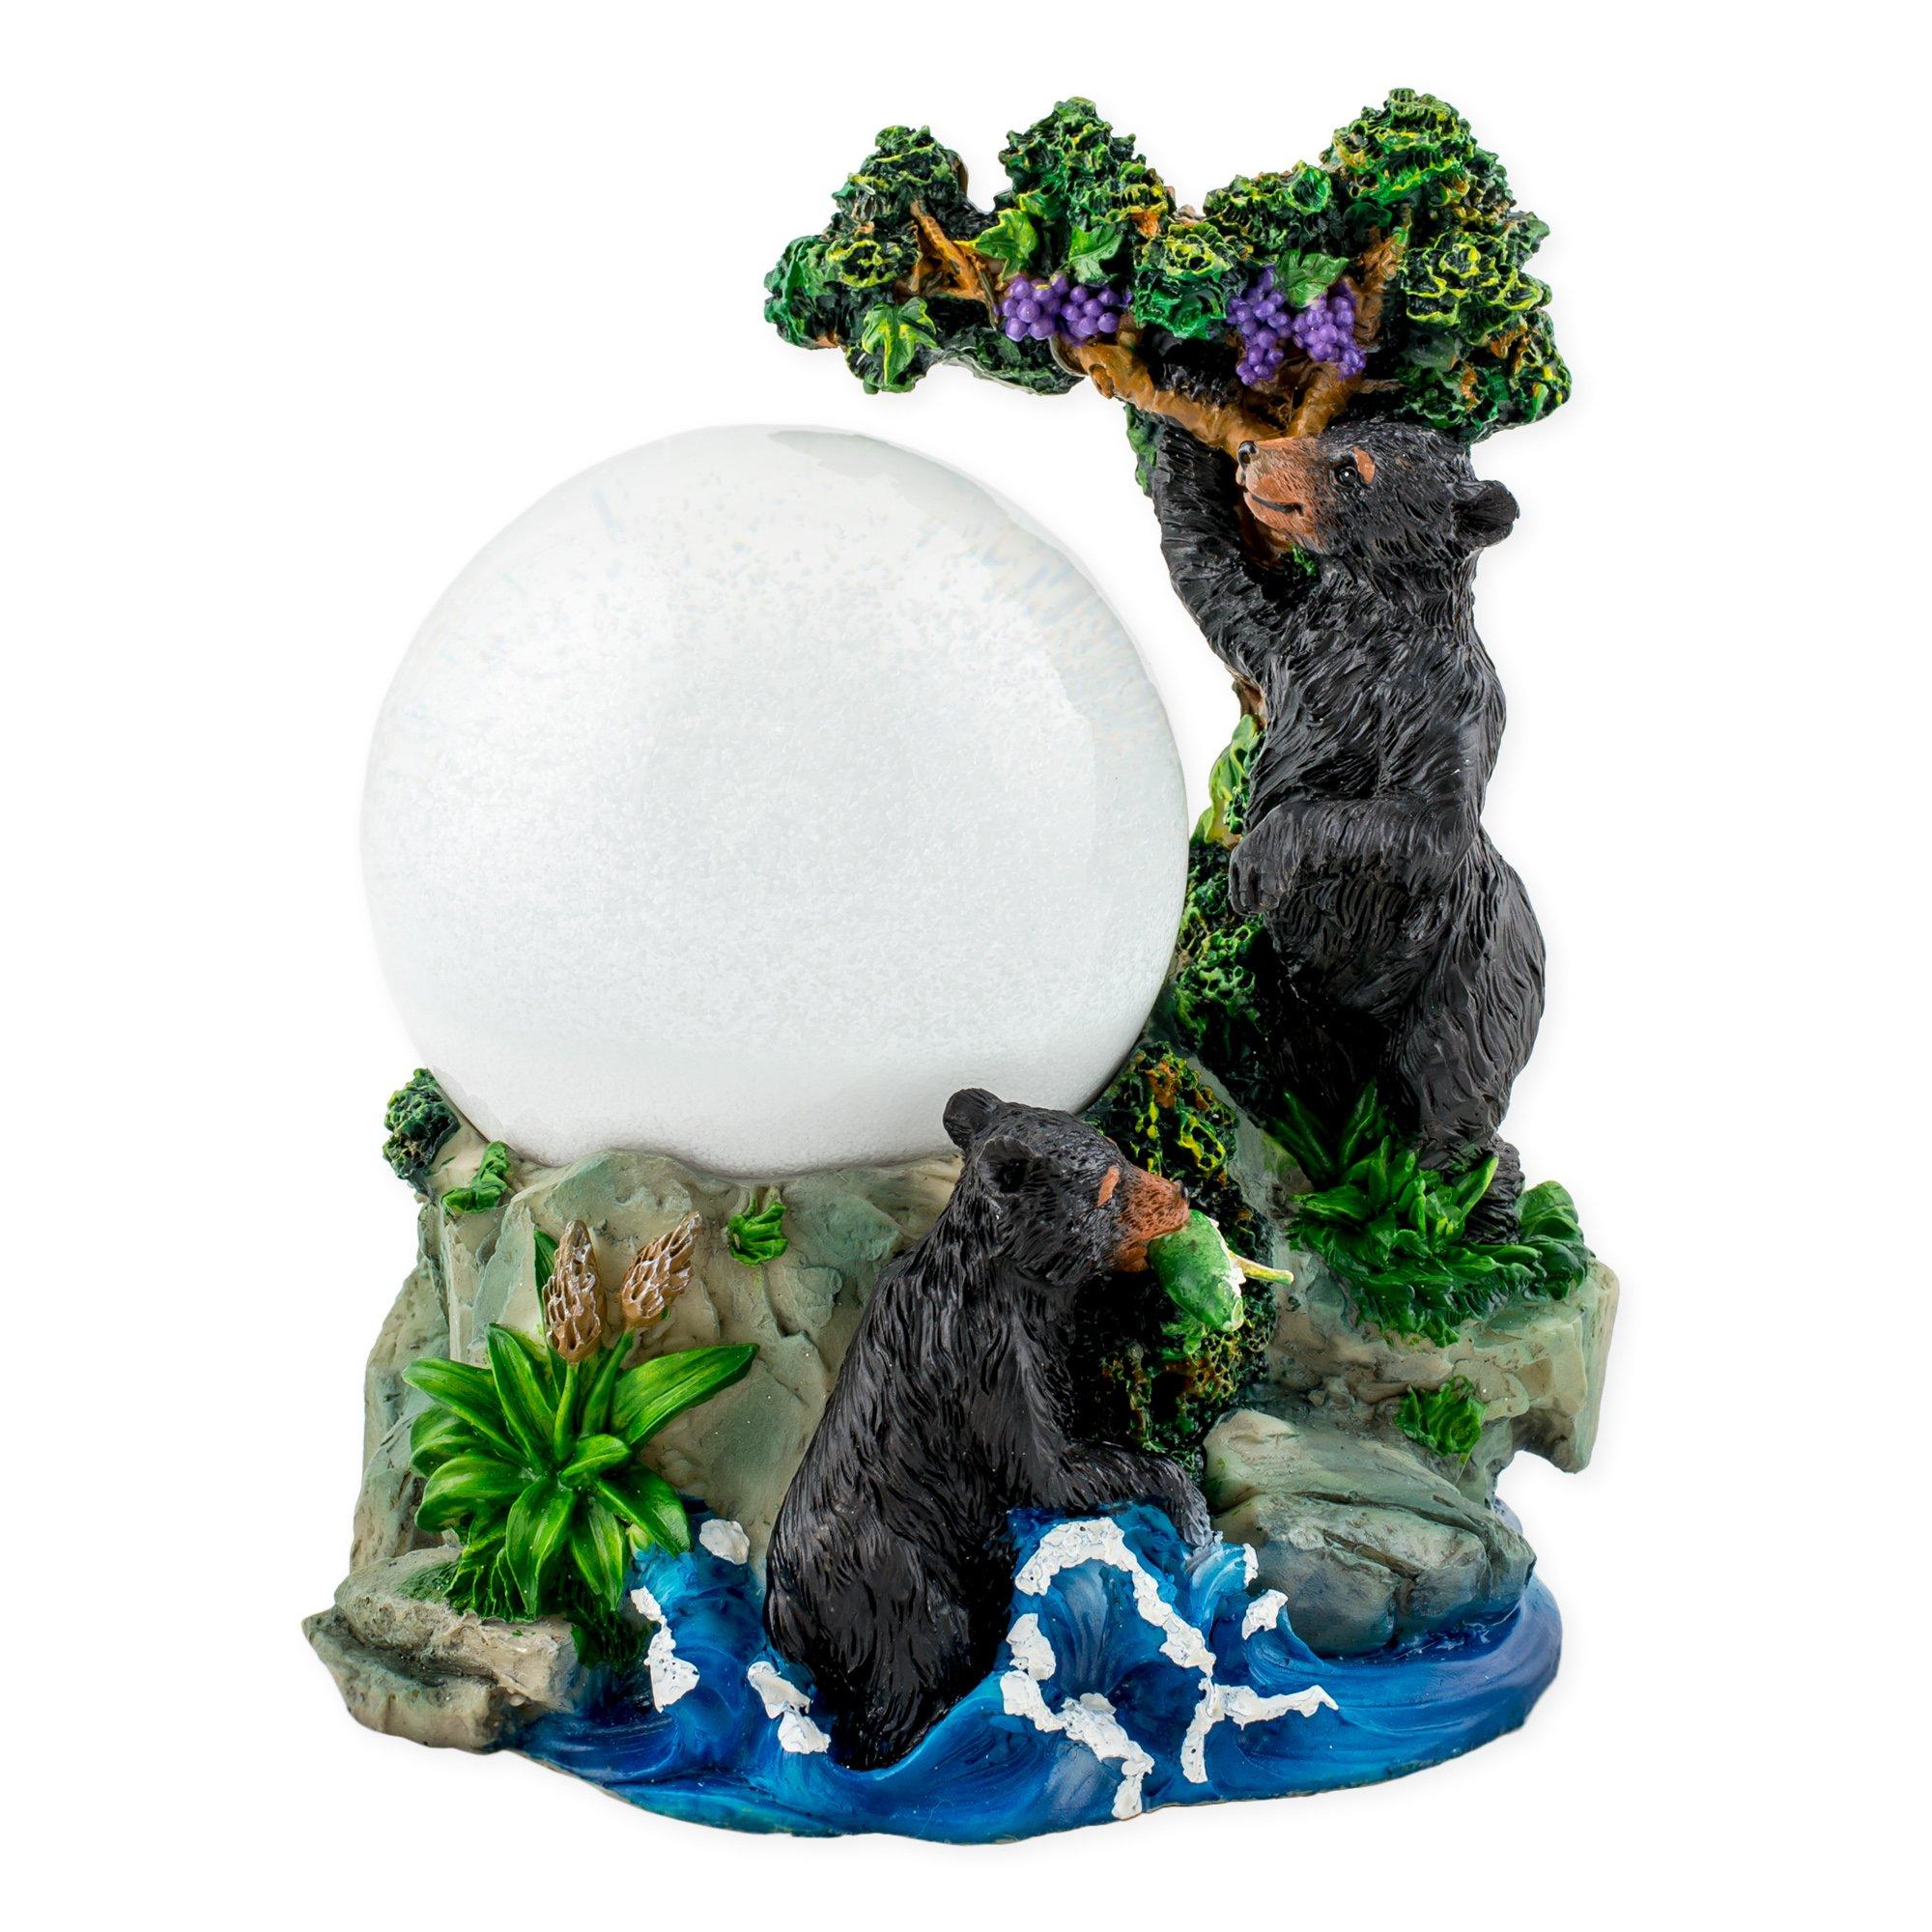 Playful Wild Black Bears 100mm Resin 3D Water Globe Plays Tune Born Free